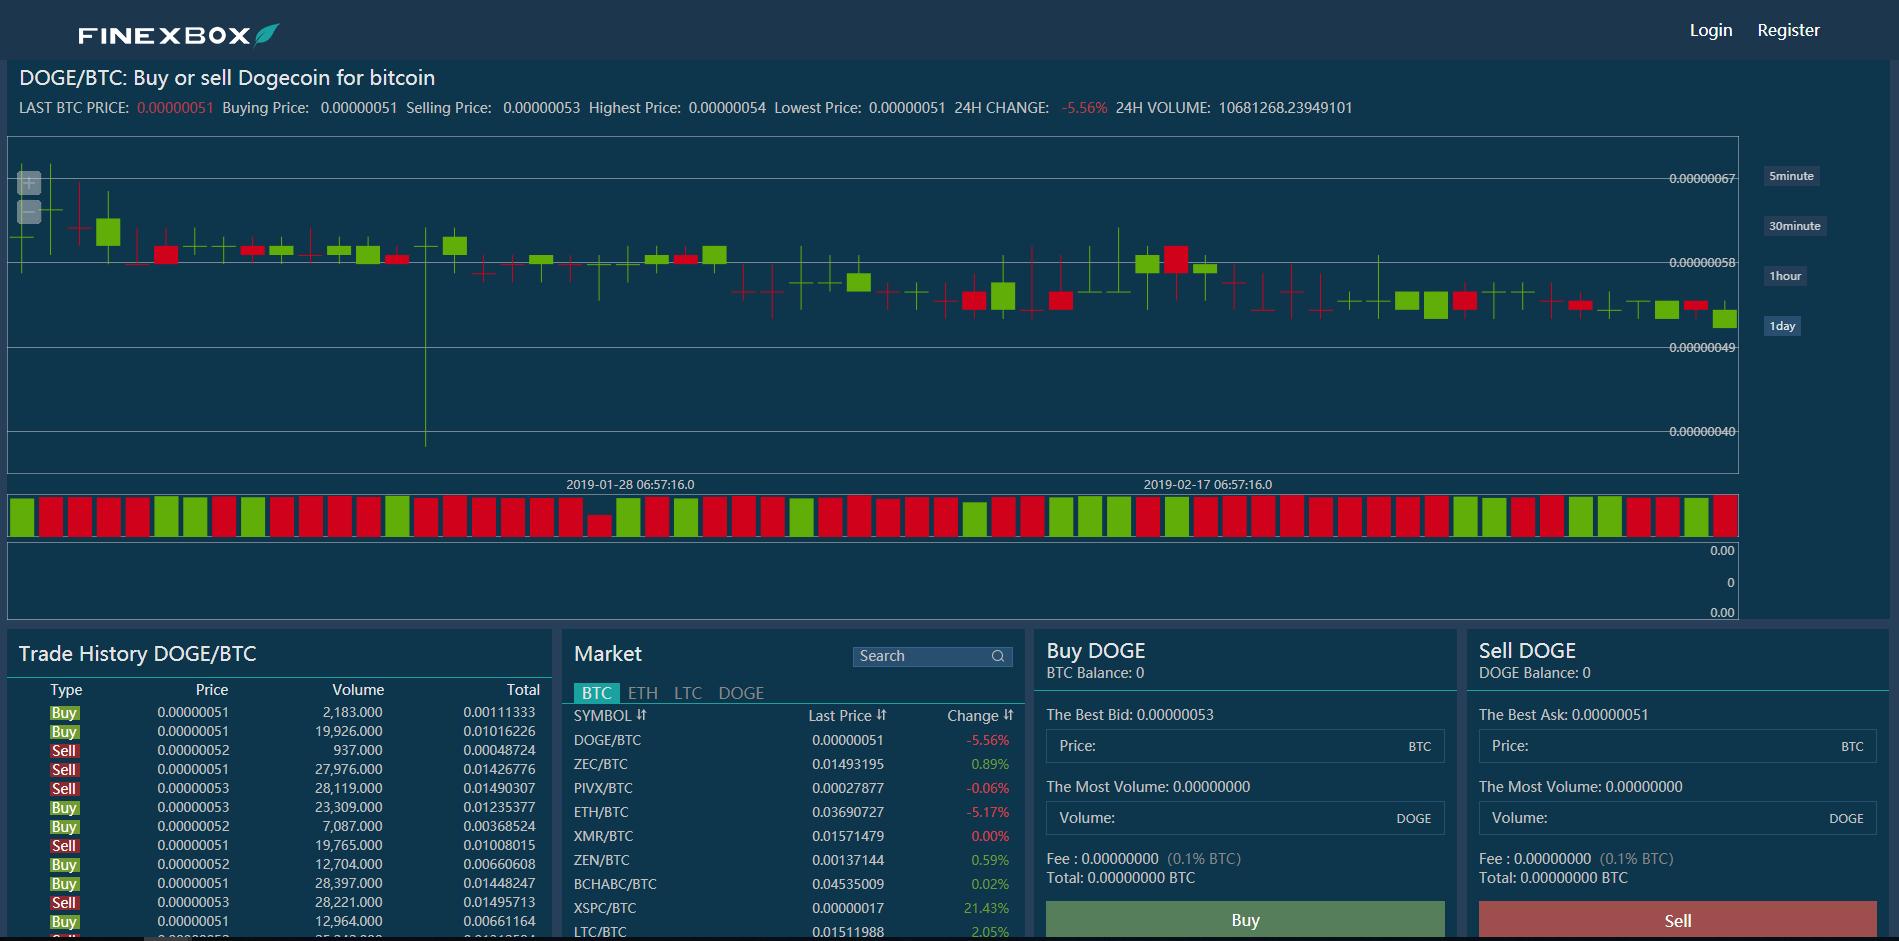 FinexBox Trading View